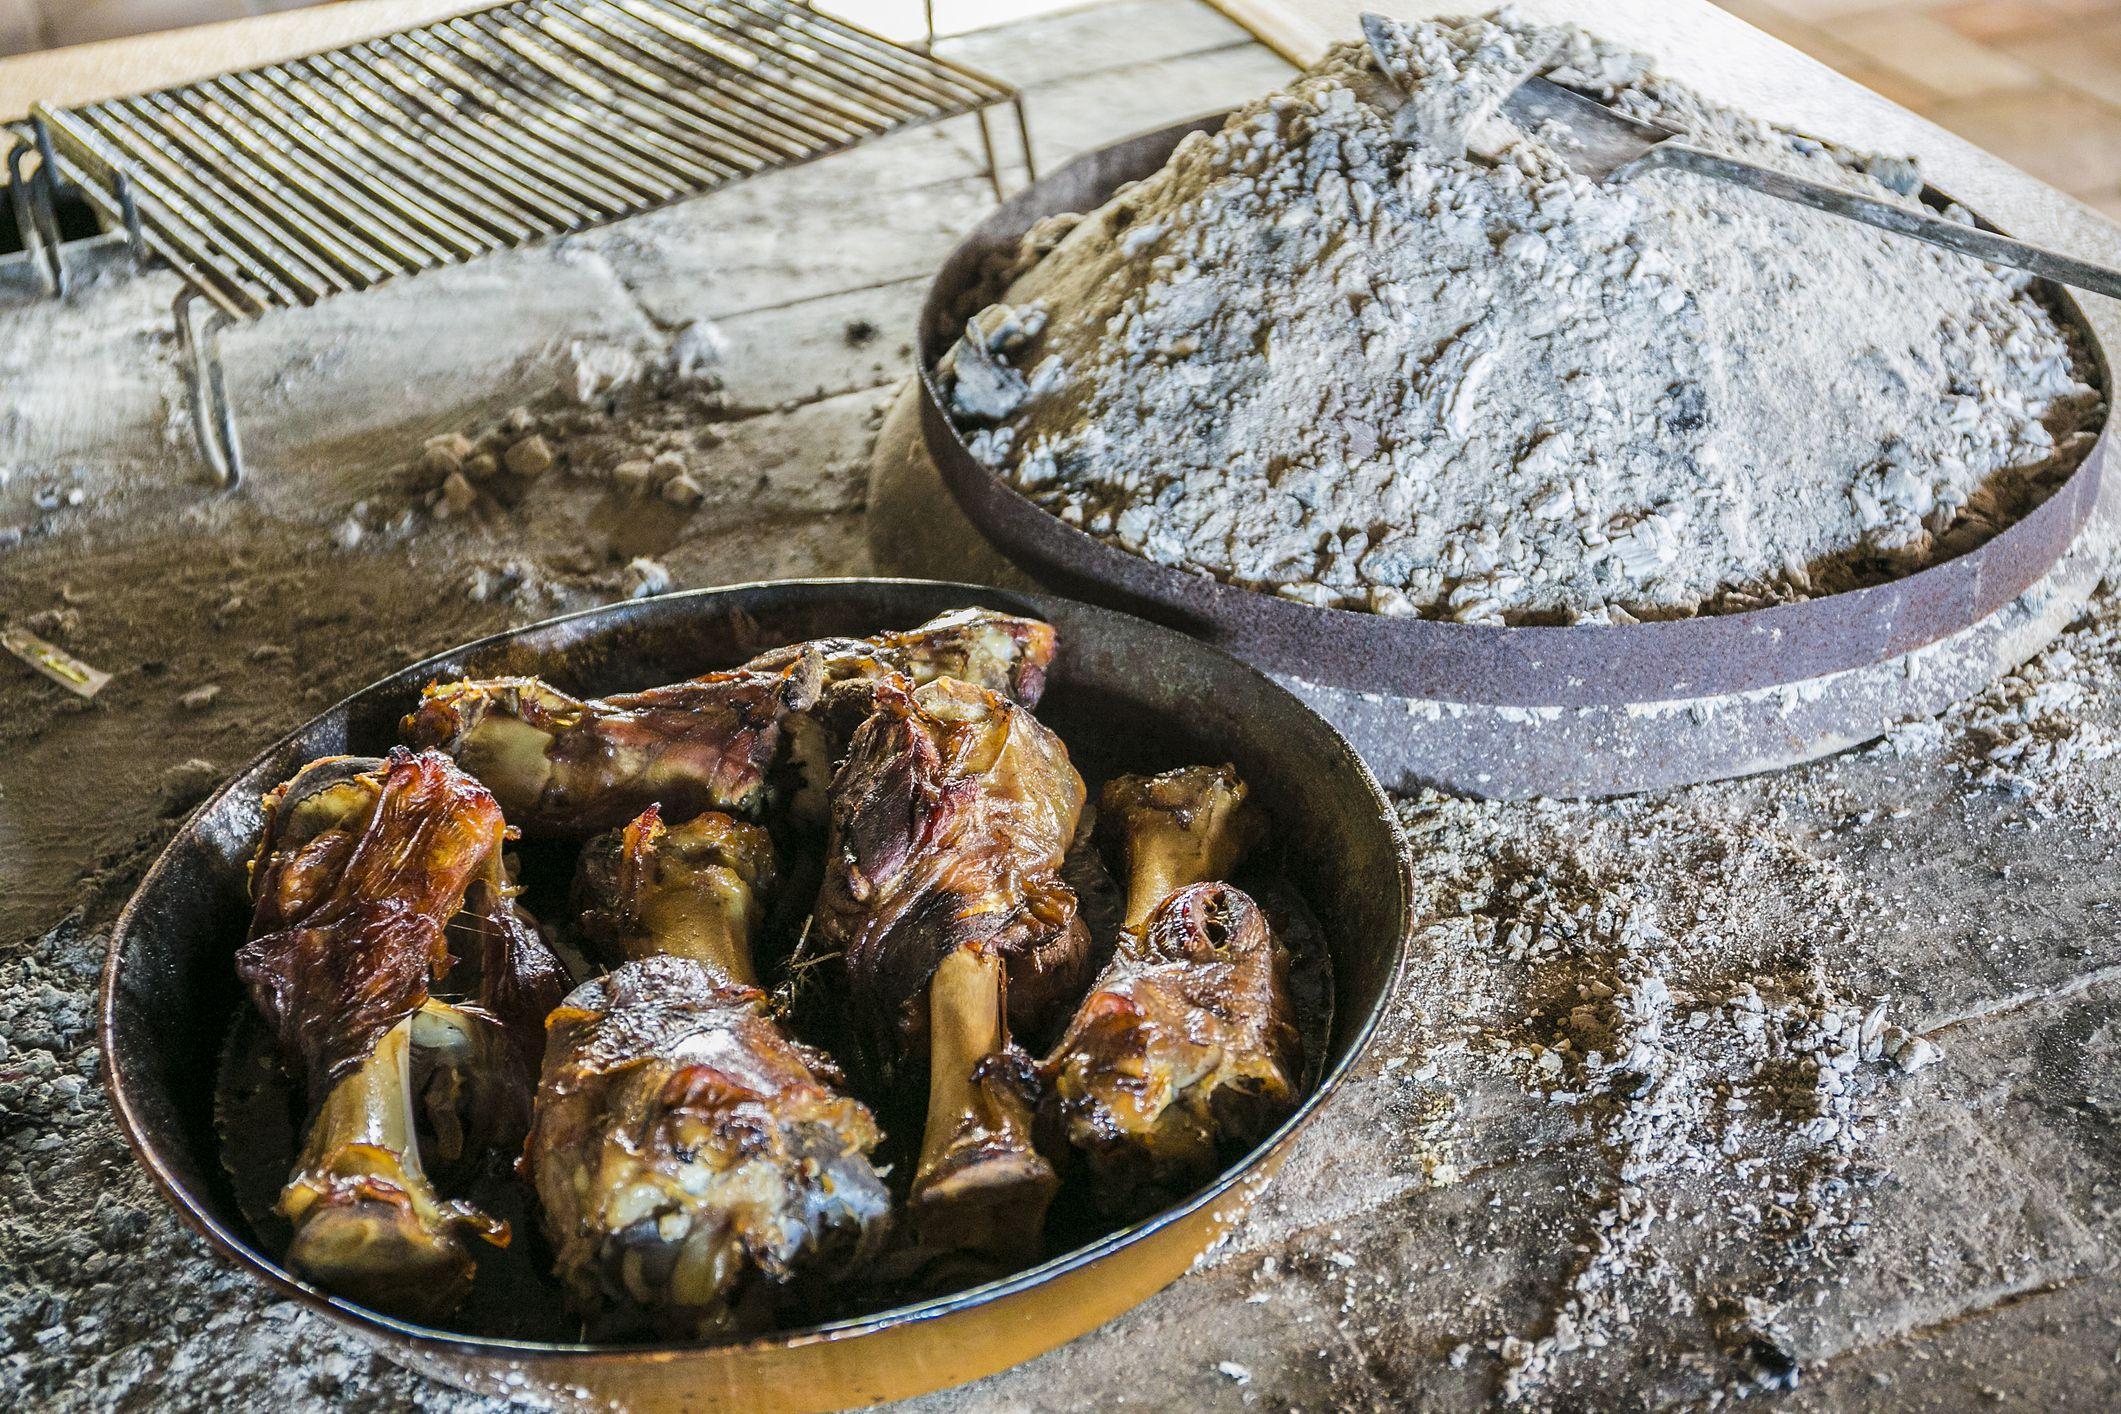 Peka, traditional dish of Dalmatia Region